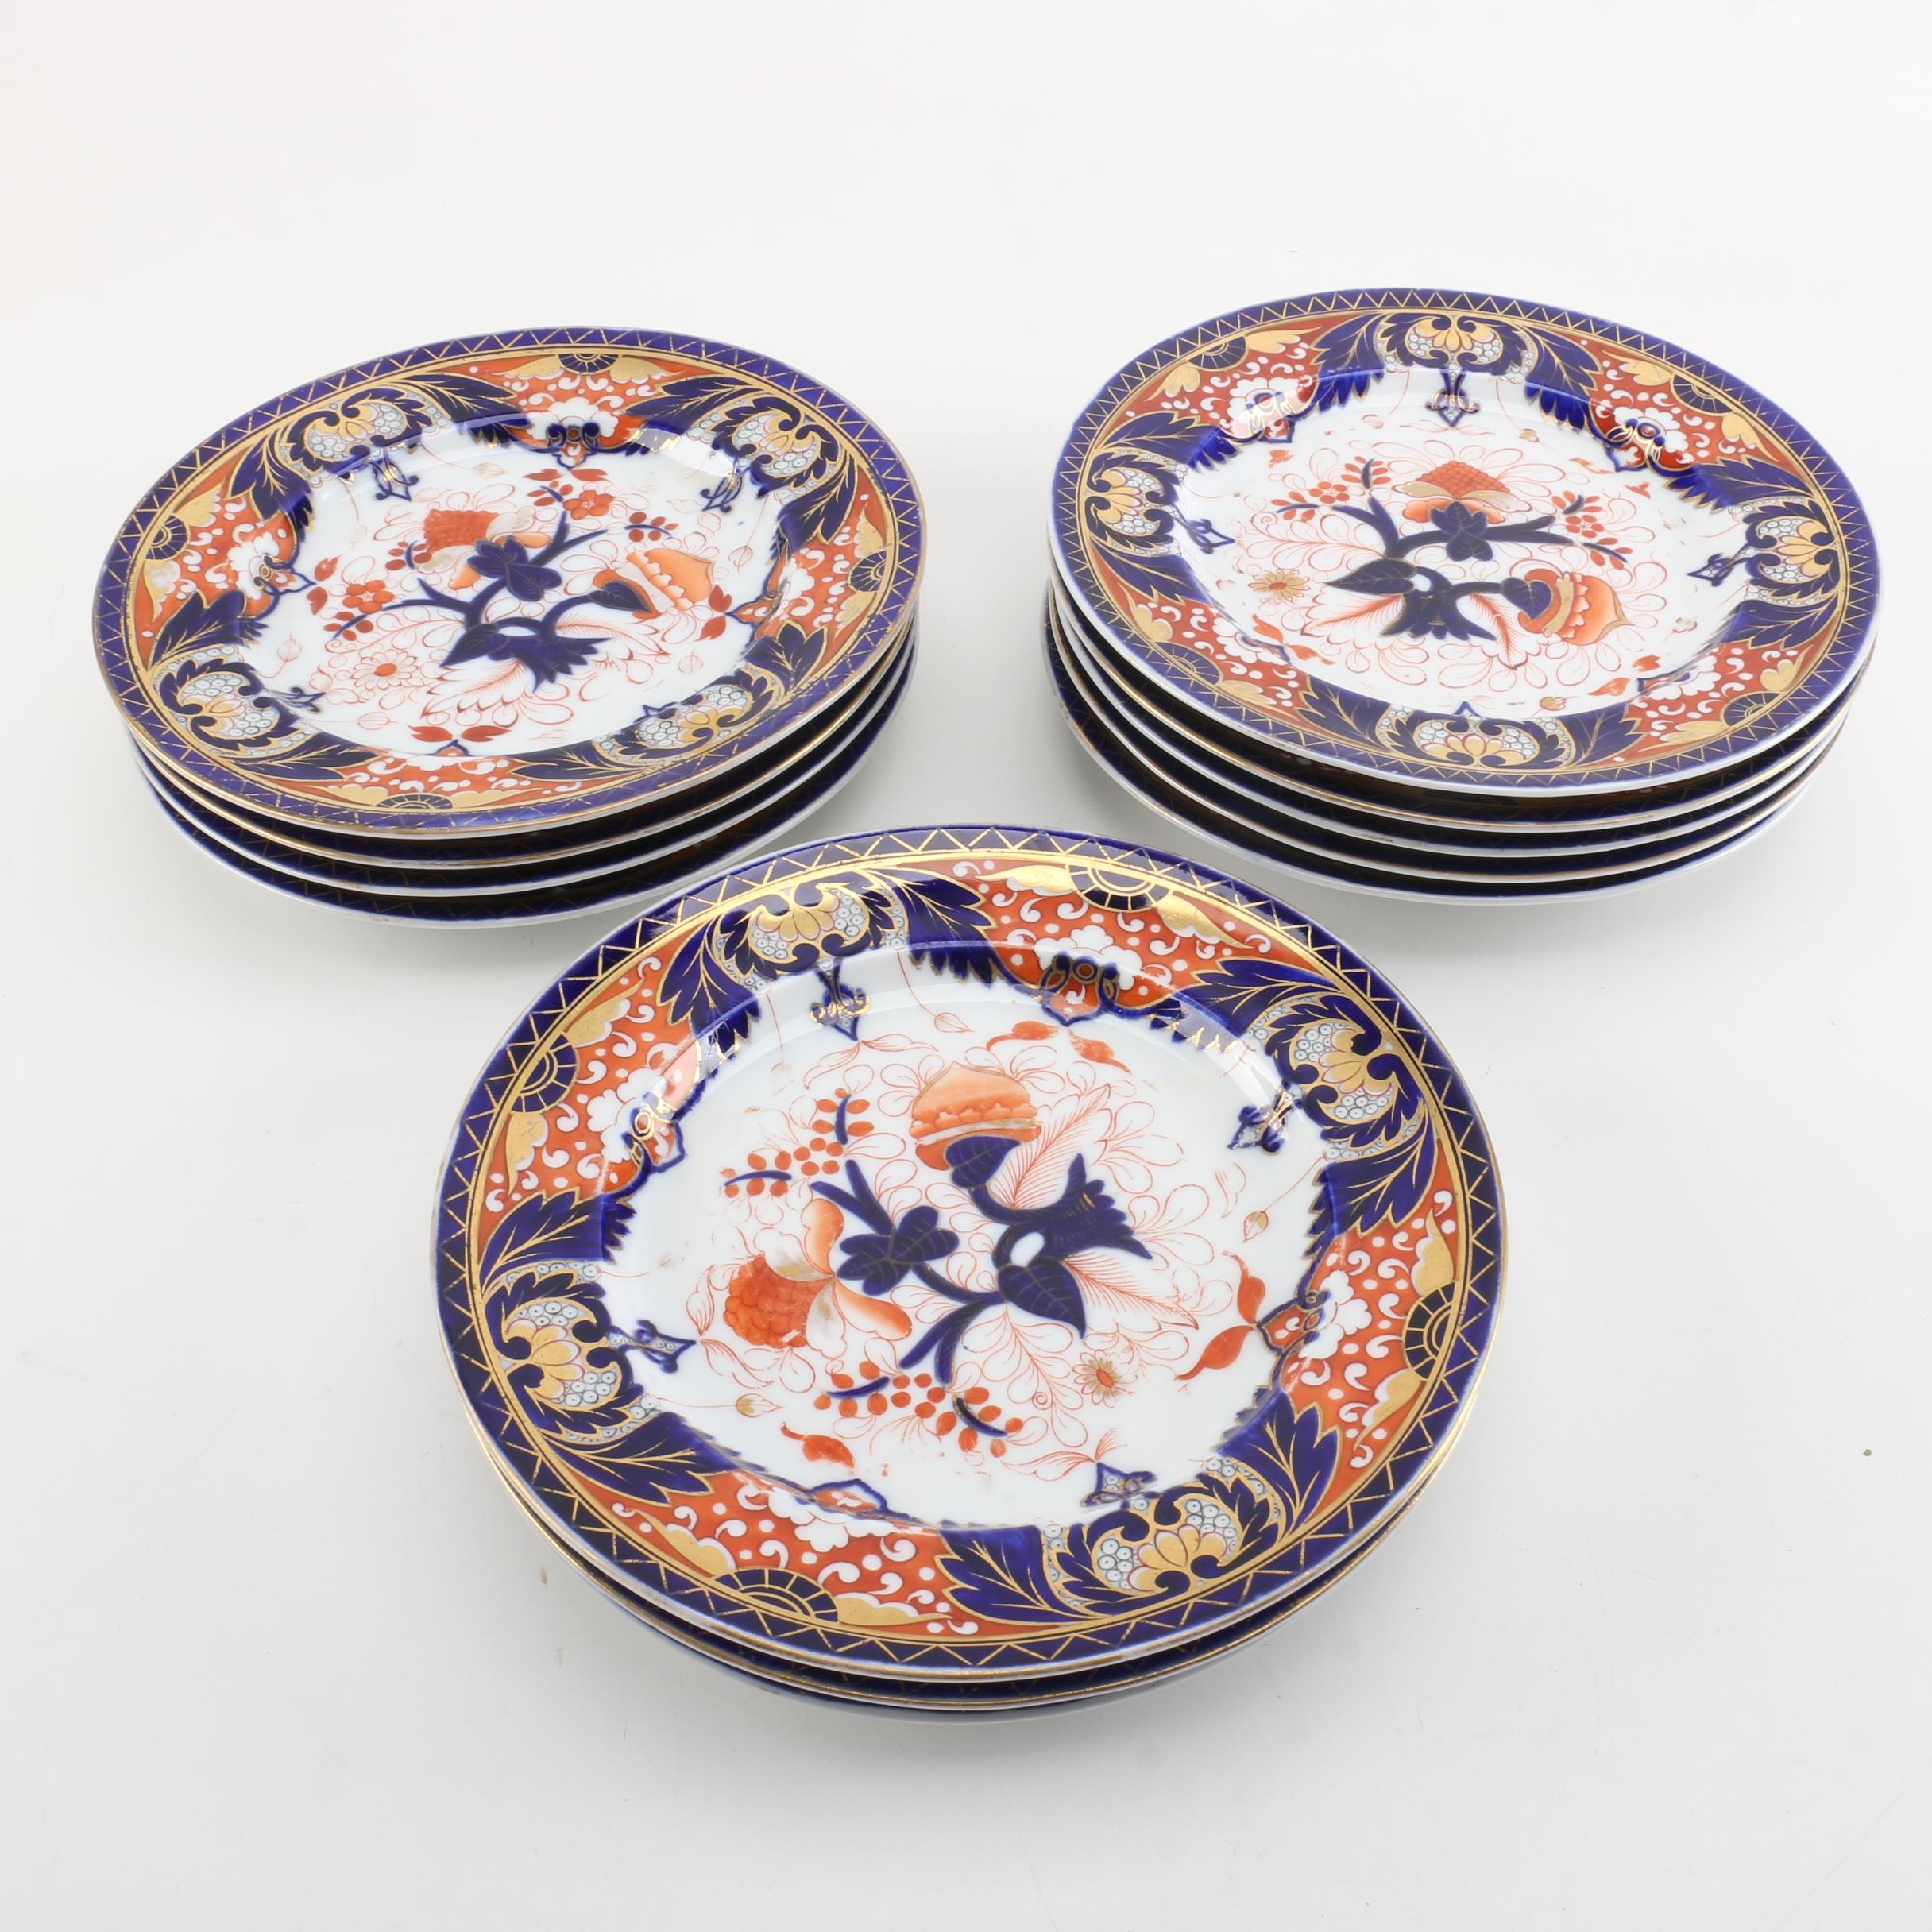 Antique Chamberlains Regent China Dinner Plates 1840-45